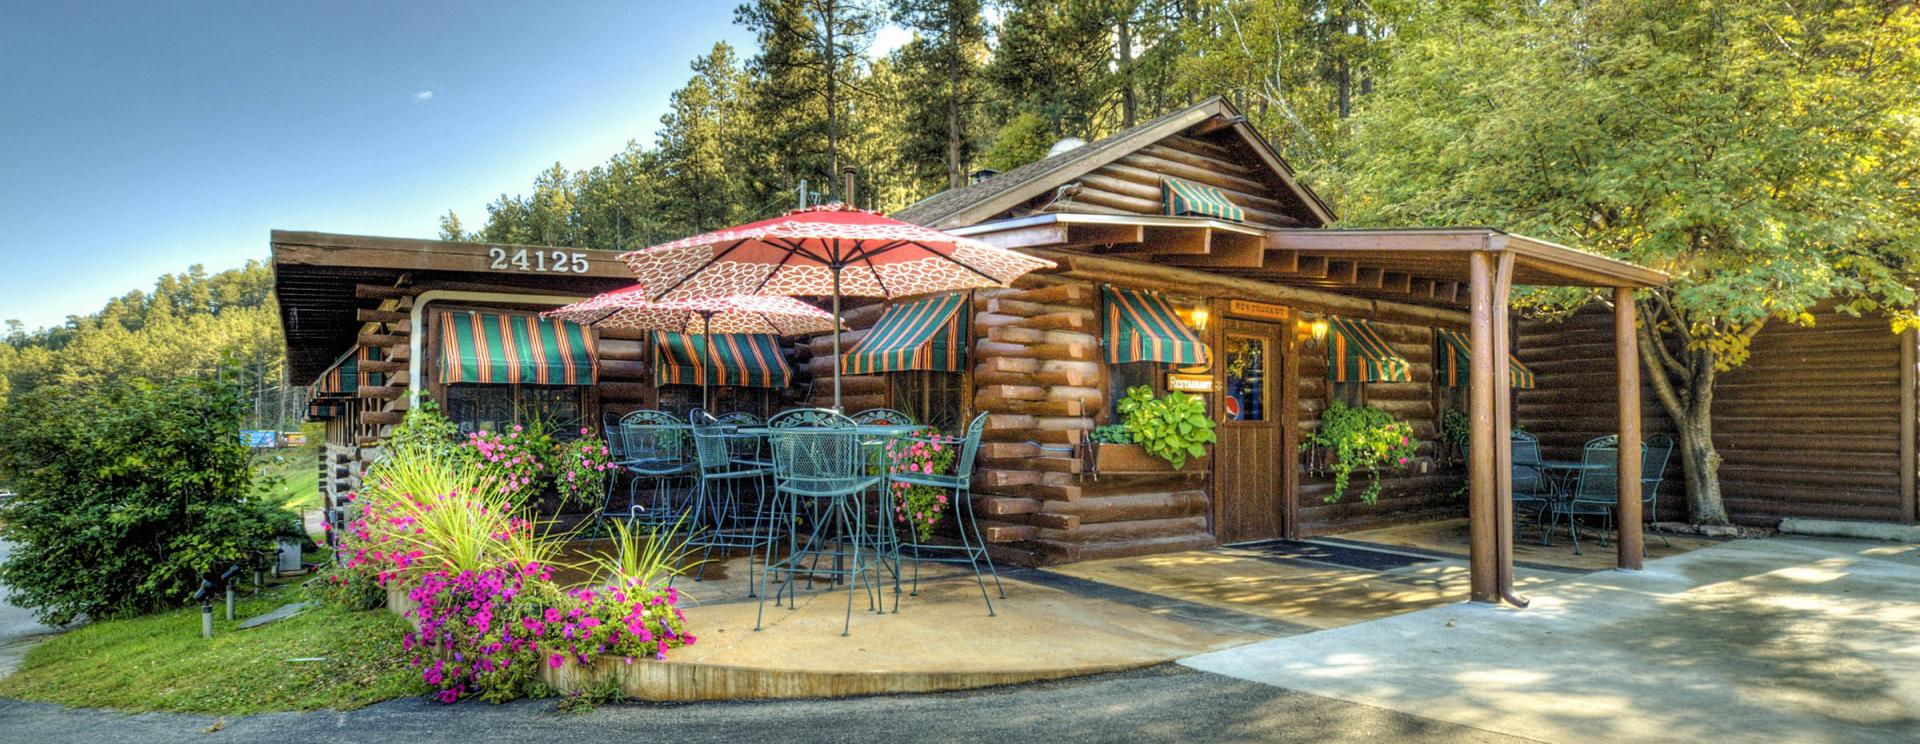 Powder House Lodge